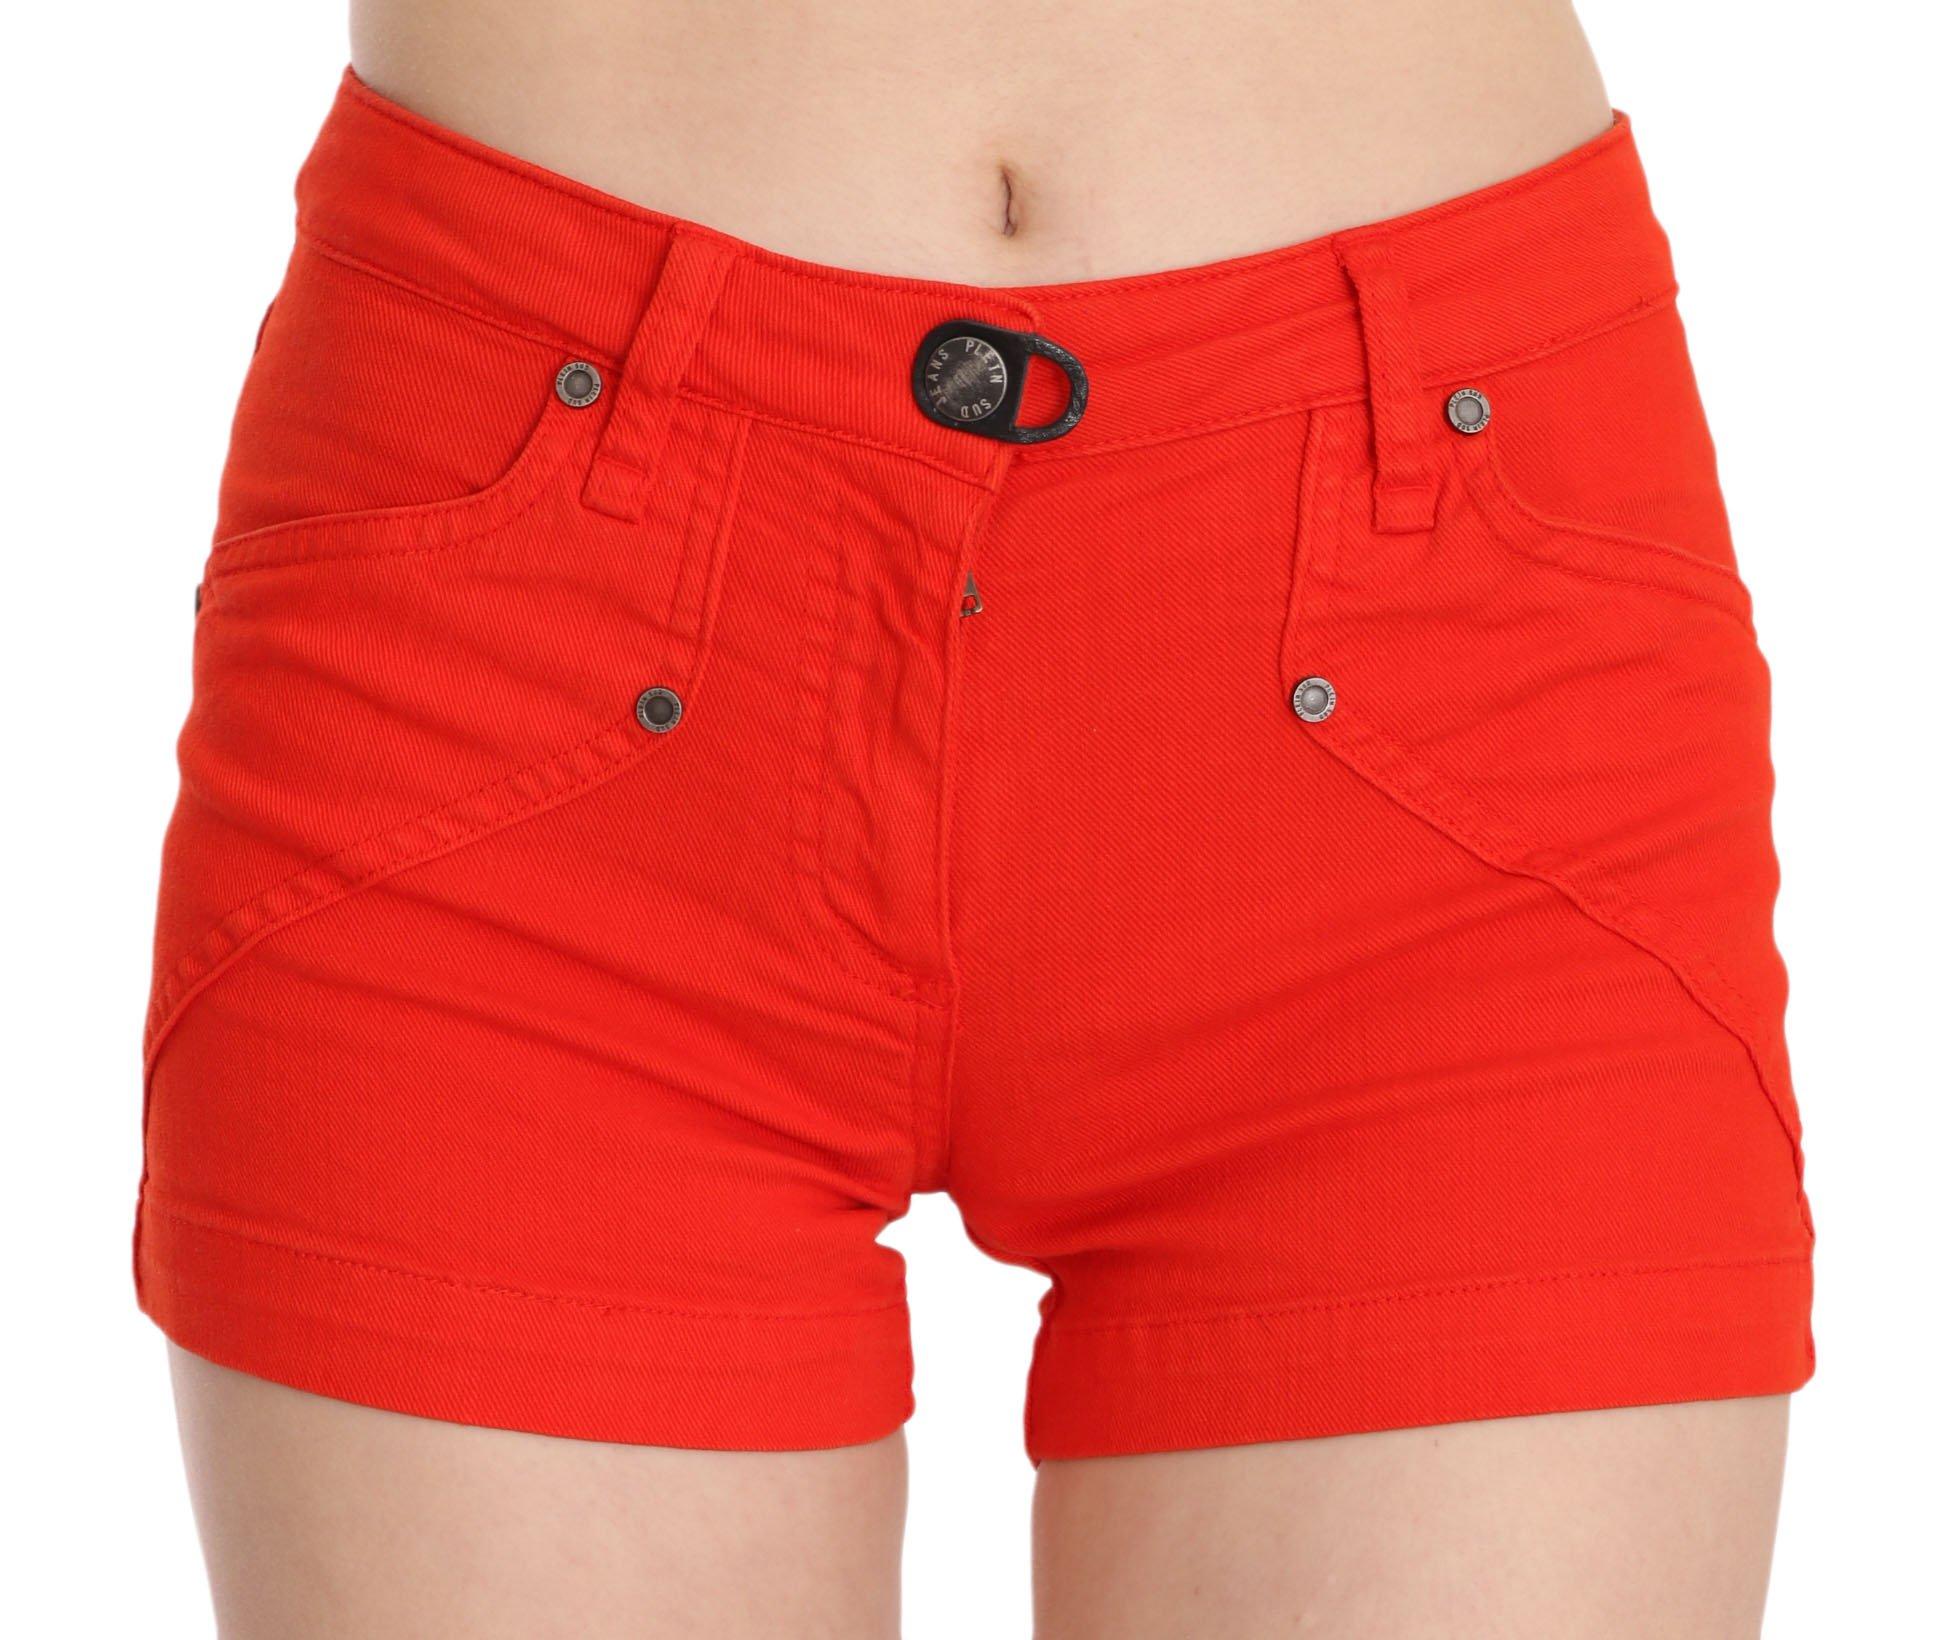 PLEIN SUD Women's Mid Waist Cotton Denim Mini Short Orange PAN70251 - IT36 | XS